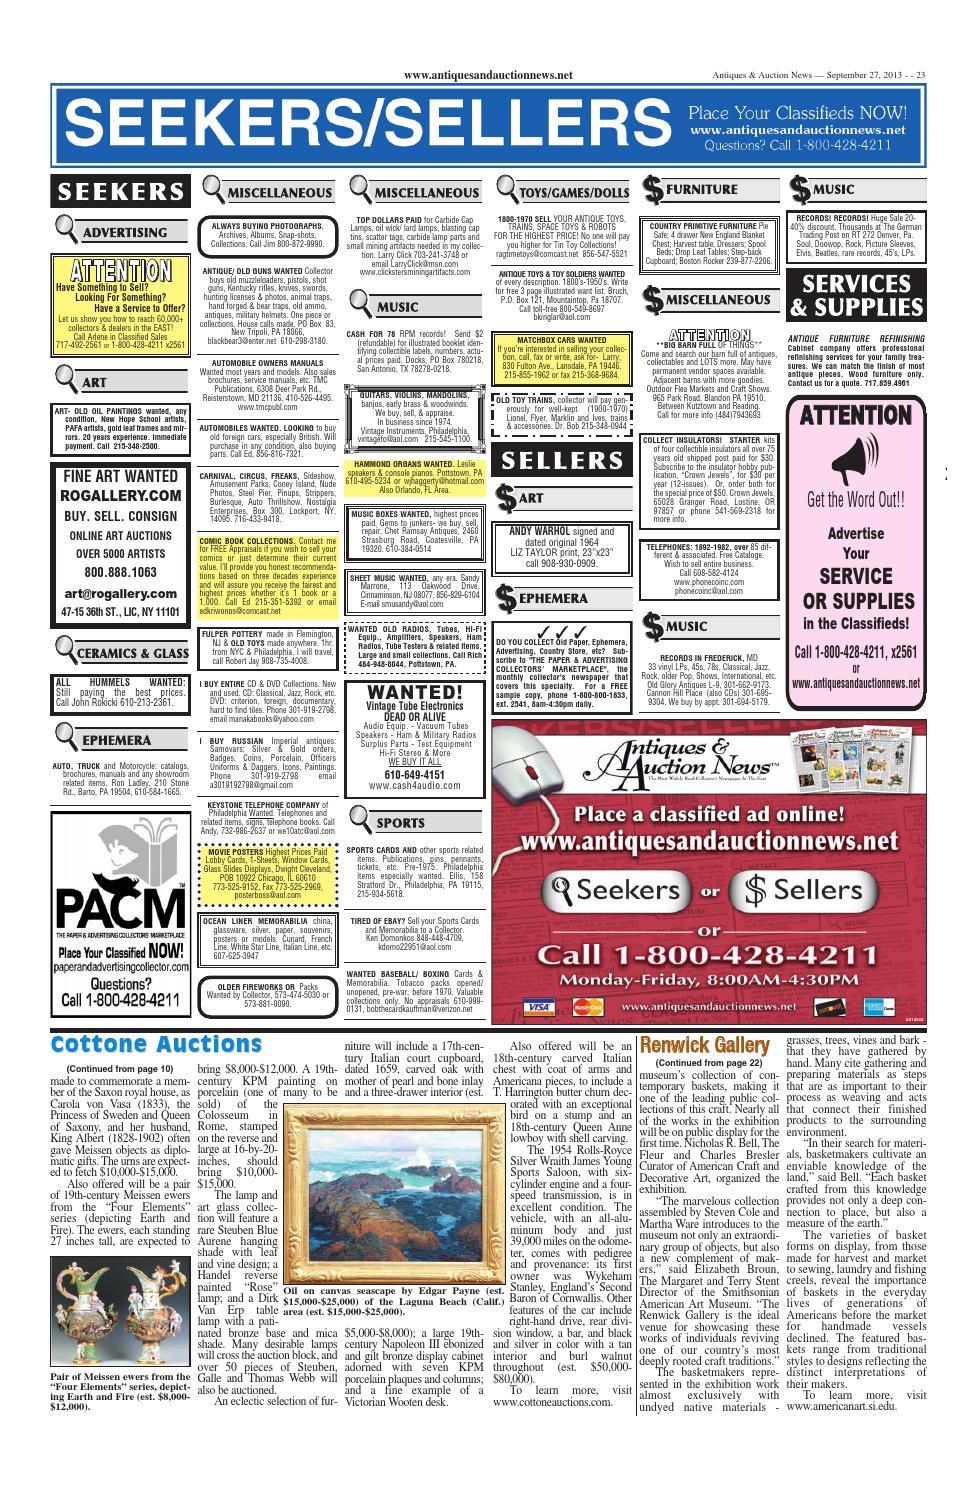 Antiques & Auction News 092713 by Antiques & Auction News